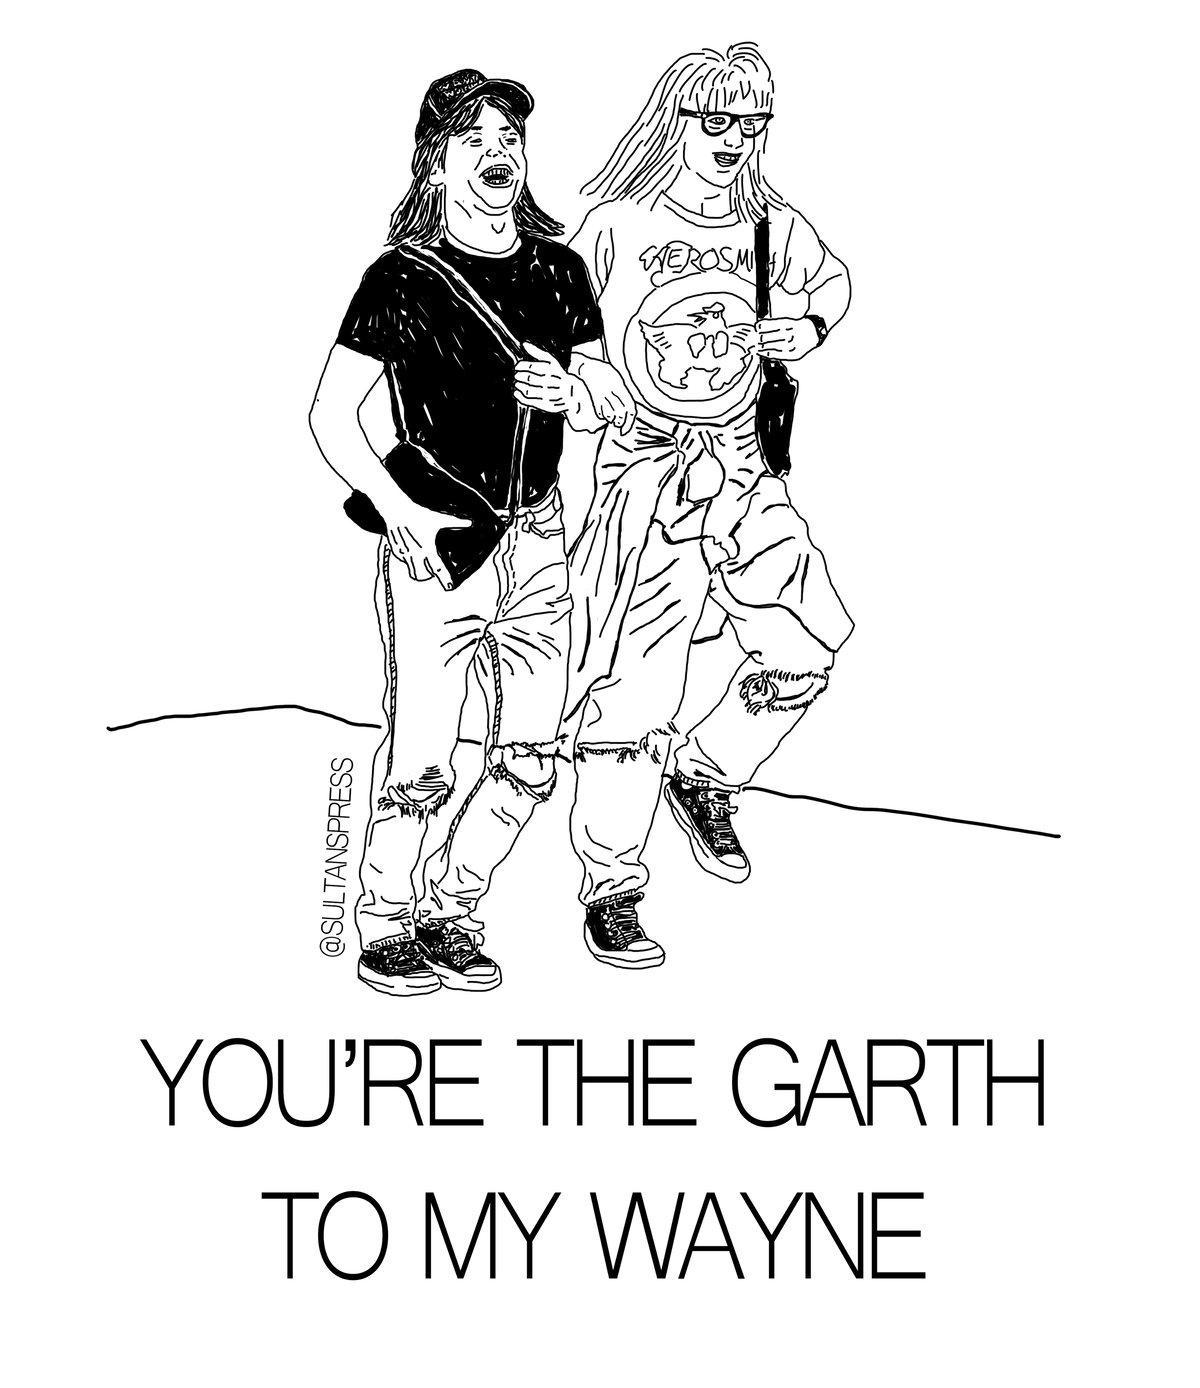 Image of Wayne & Garth